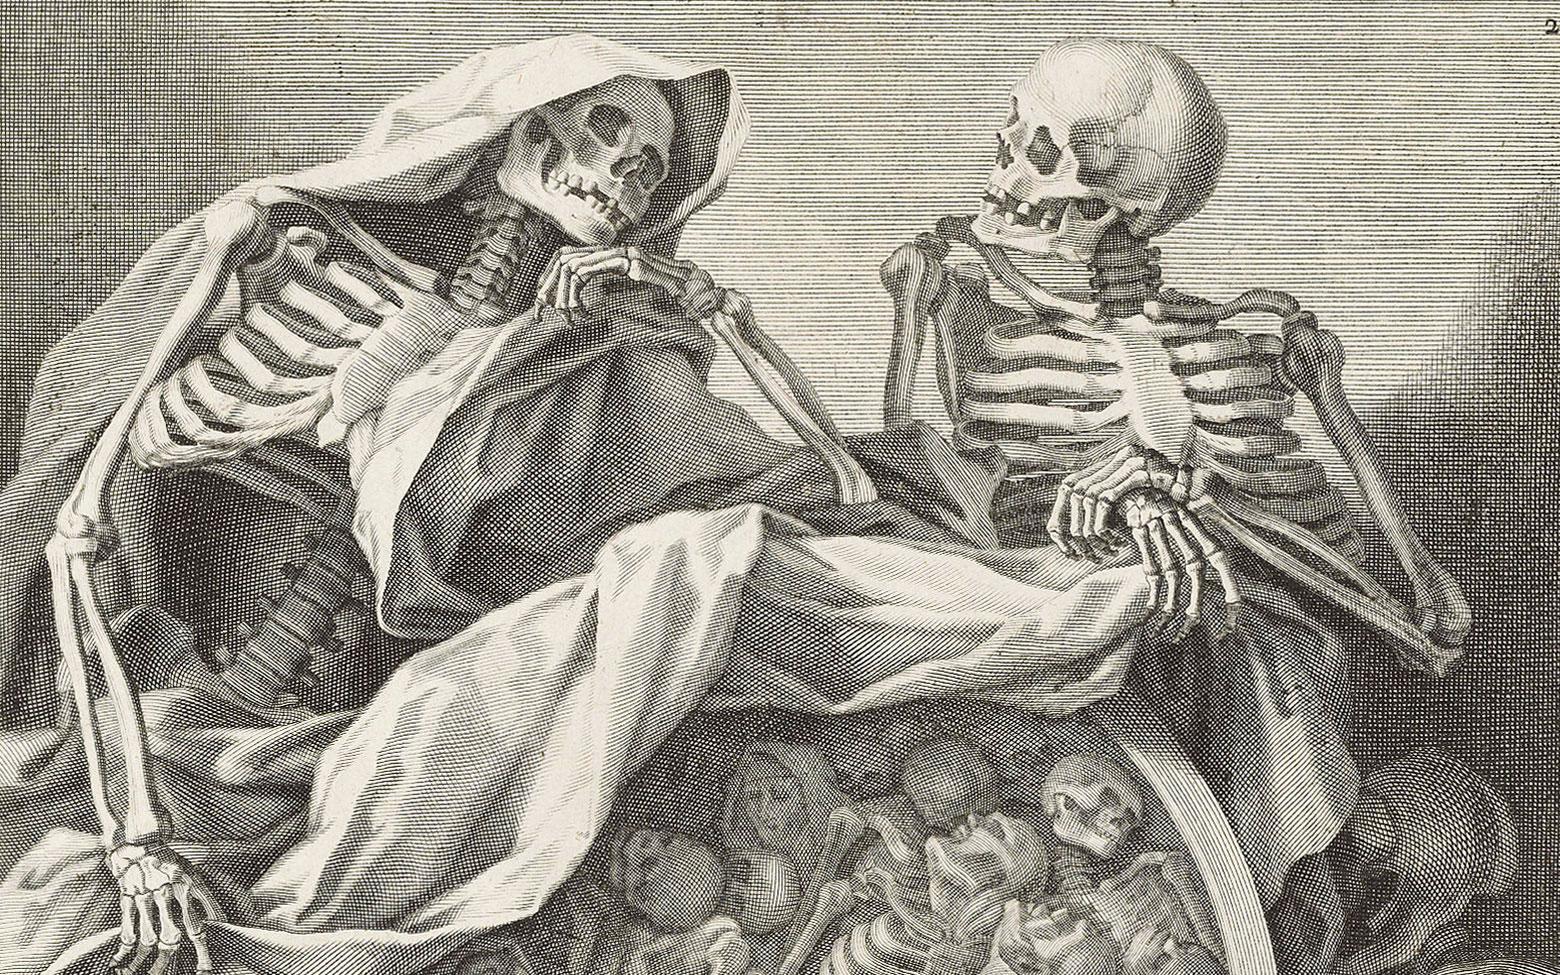 Death, desire and dark visions